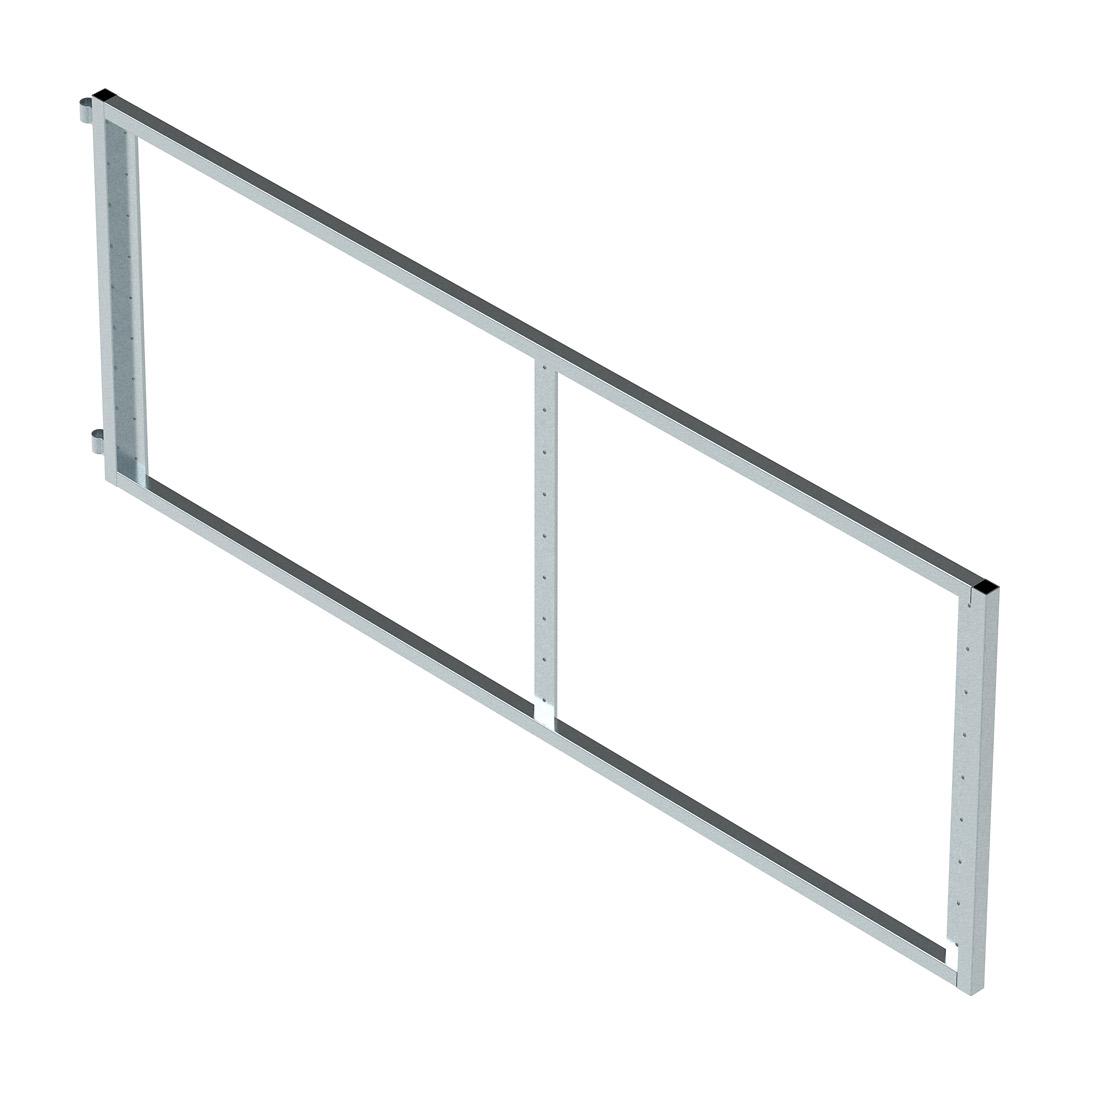 Sheepyard gate 2200mm x 850mm (frame only)